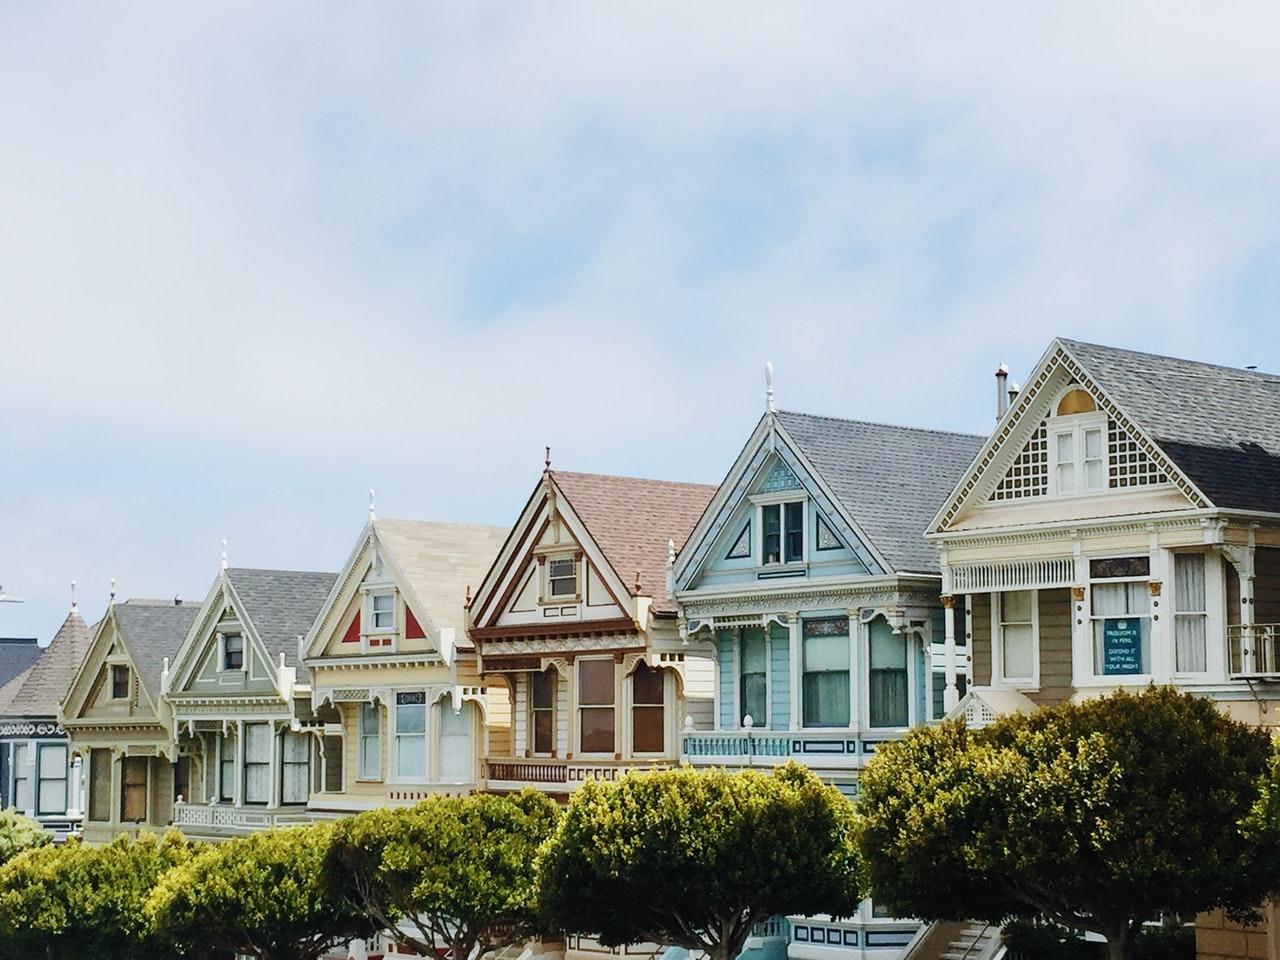 row of houses